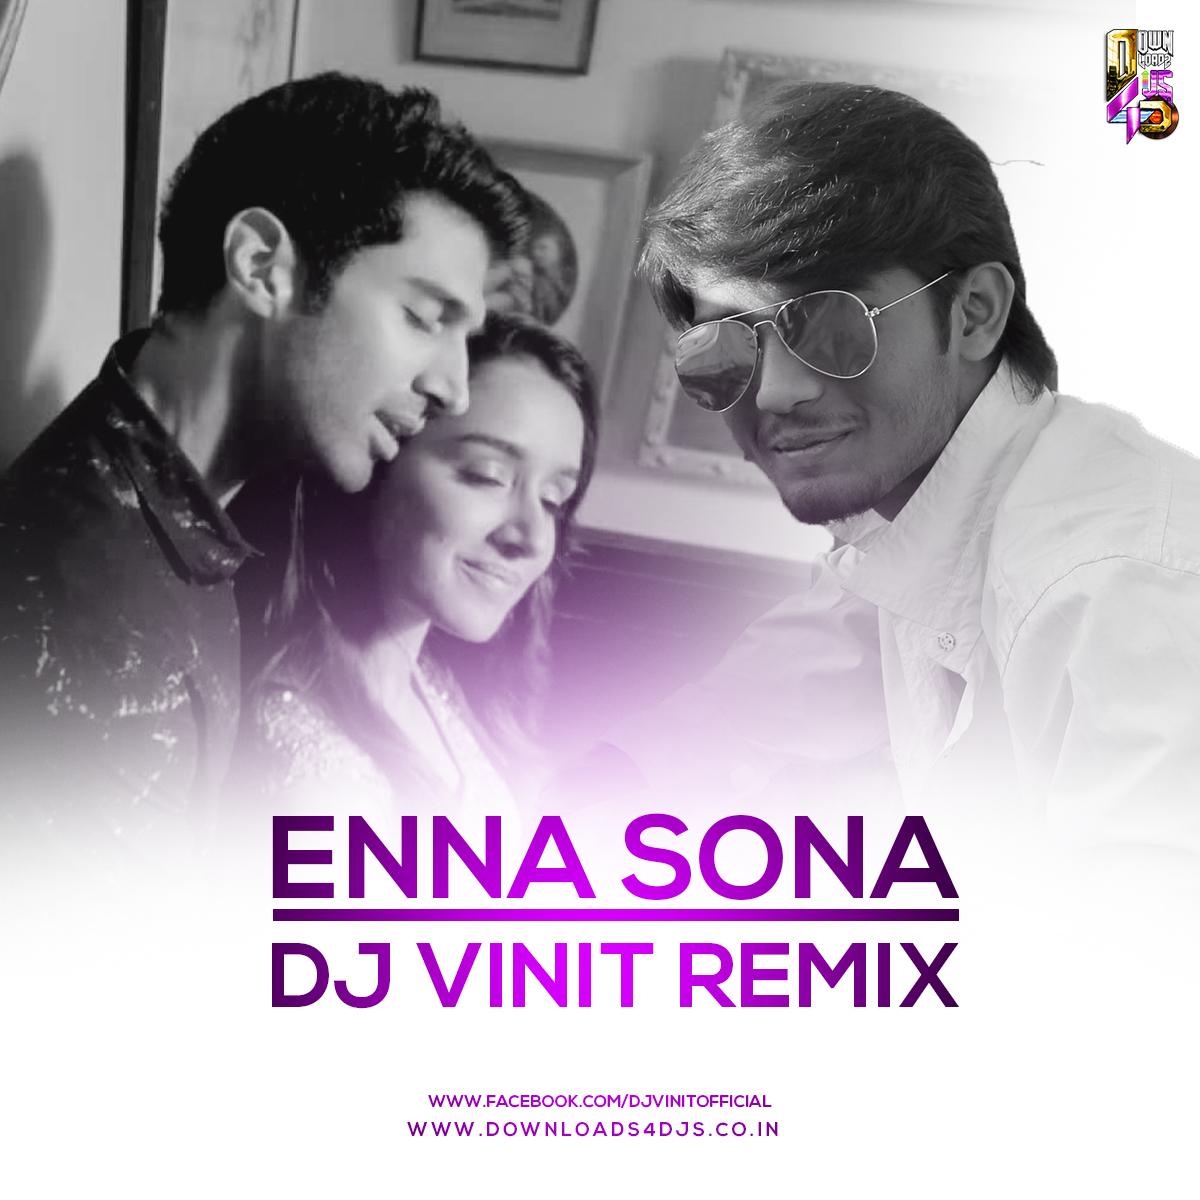 Daru Badnam Dj Remix Sapna: Enna Sona (Remix)